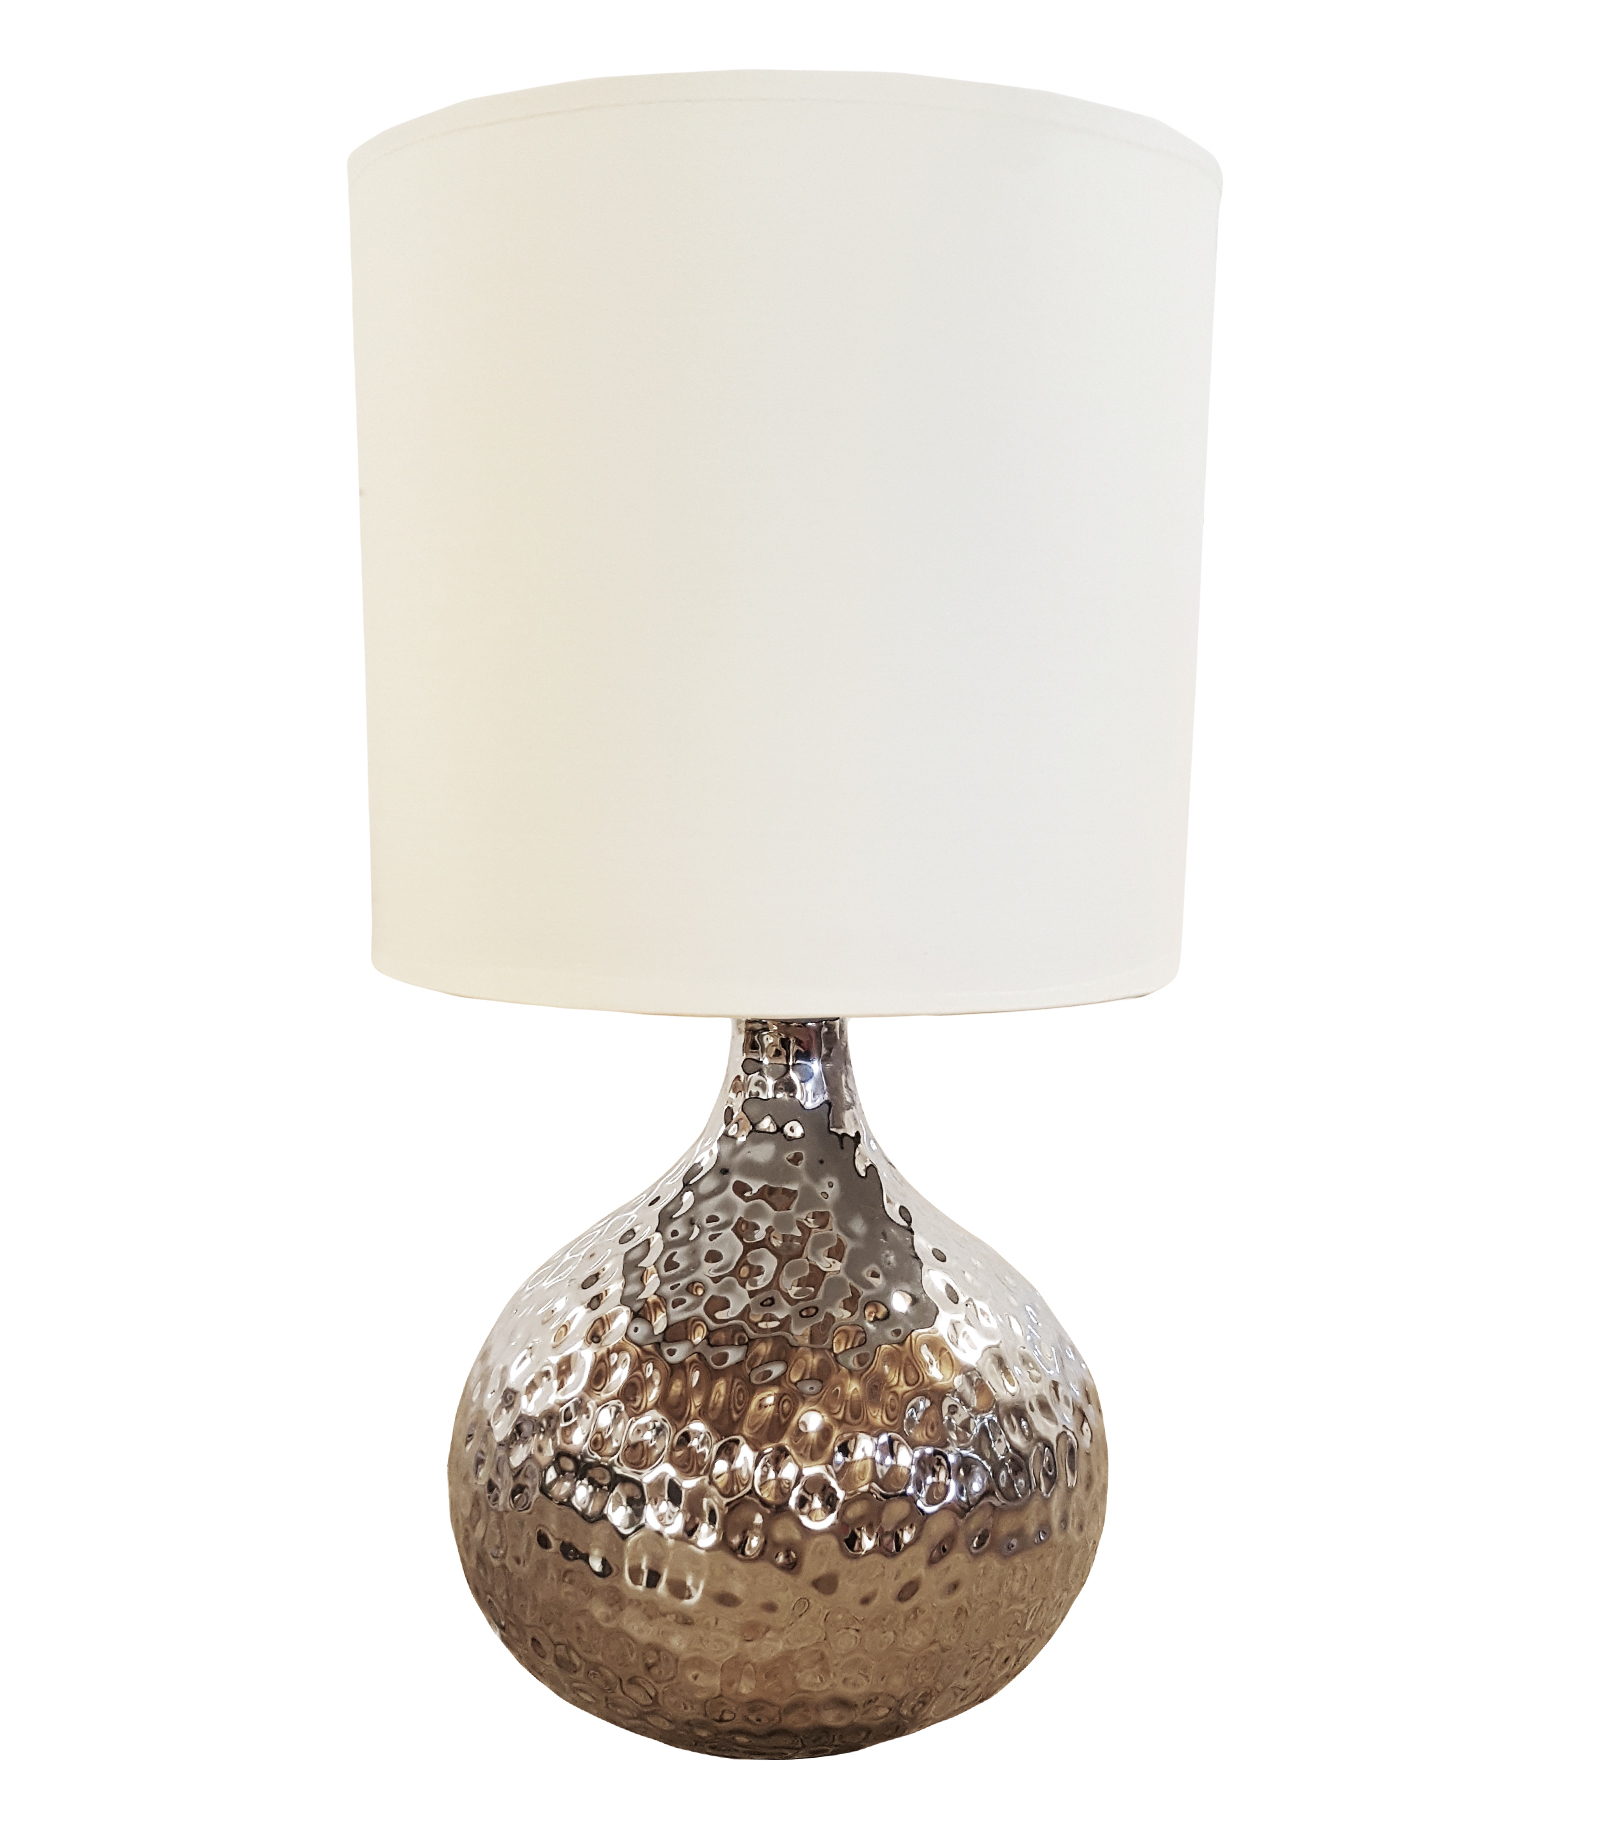 keramik lampe angi silber weiss tischlampe tischleuchte lampenfu lampenschirm ebay. Black Bedroom Furniture Sets. Home Design Ideas